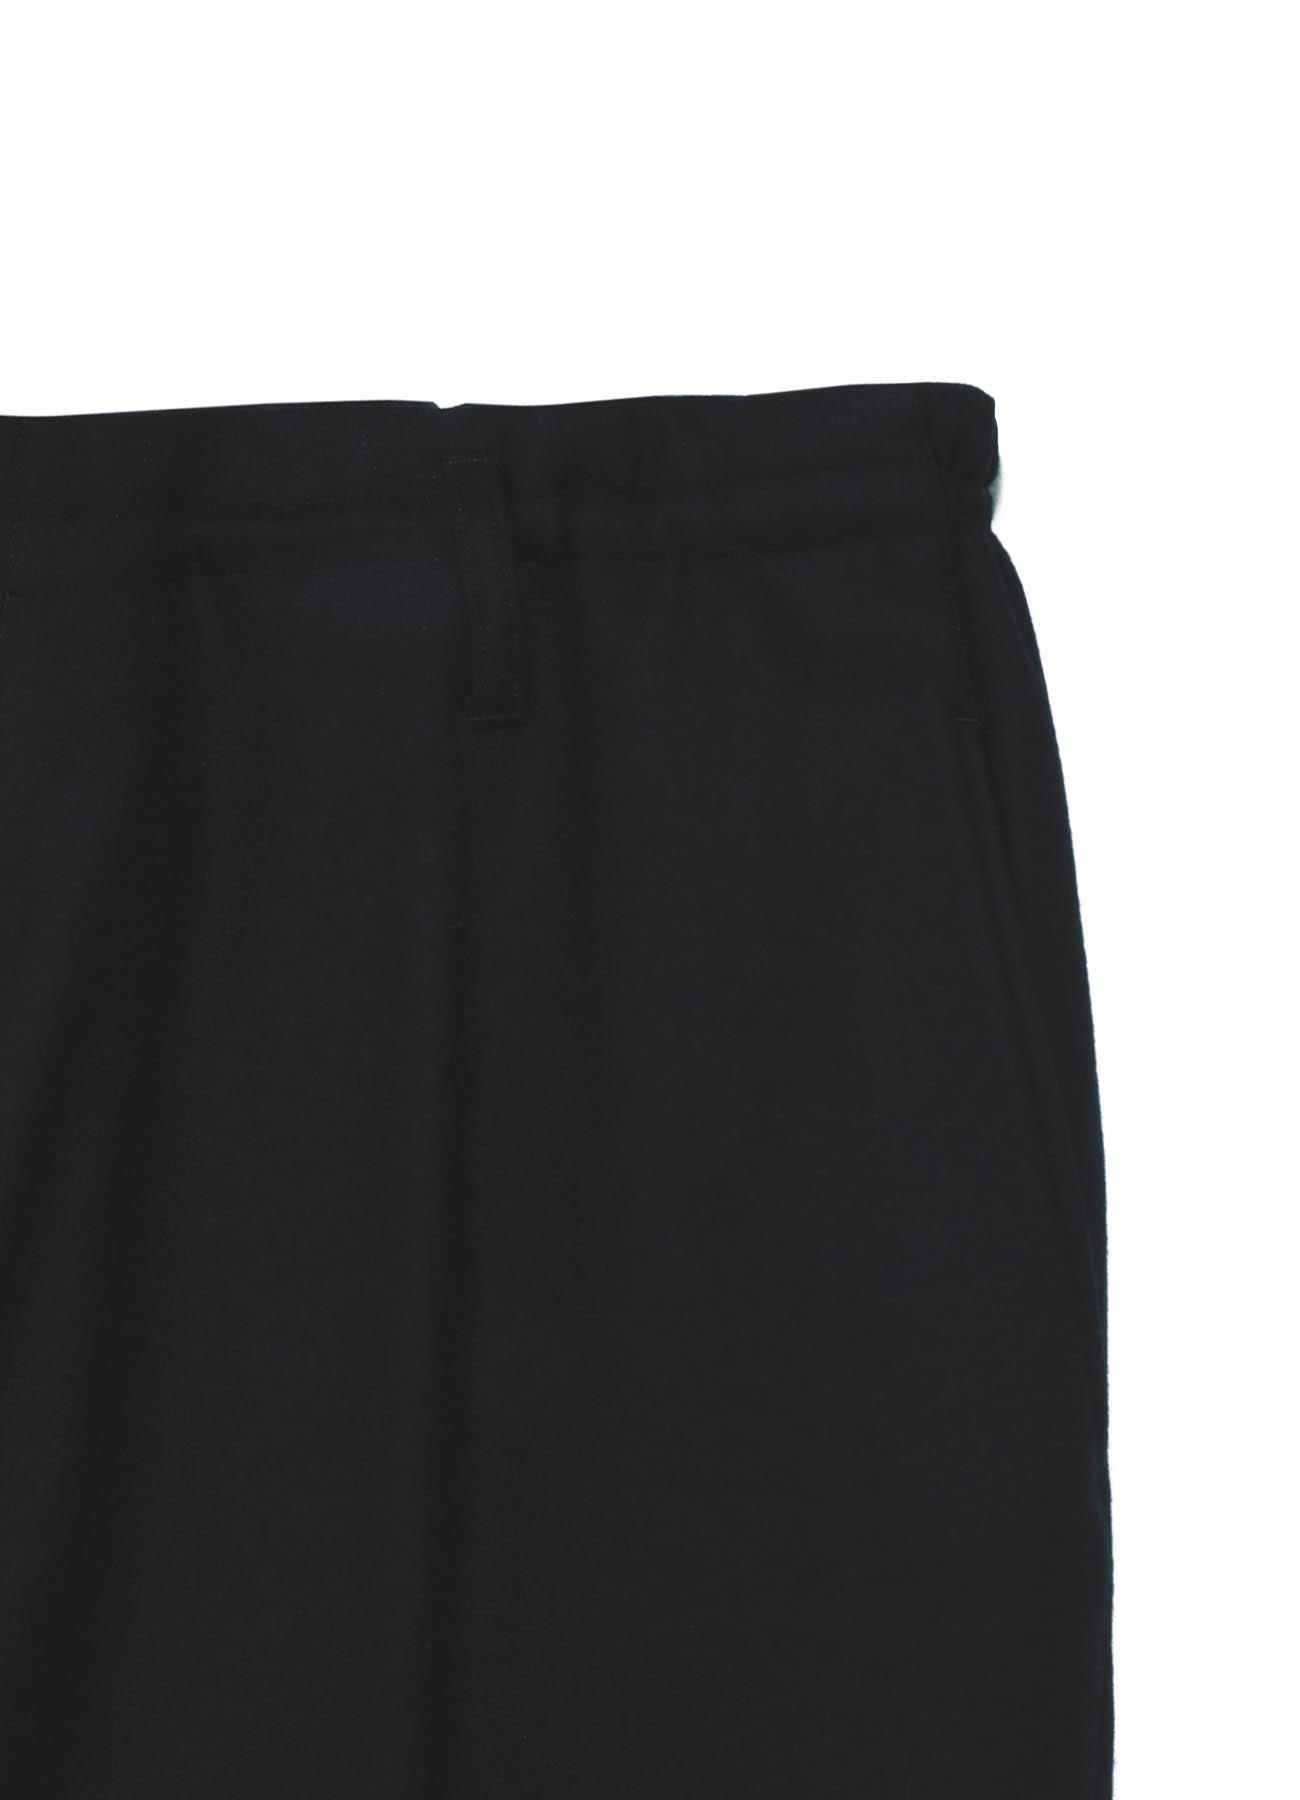 WOOL/NYLON THICK PANTS